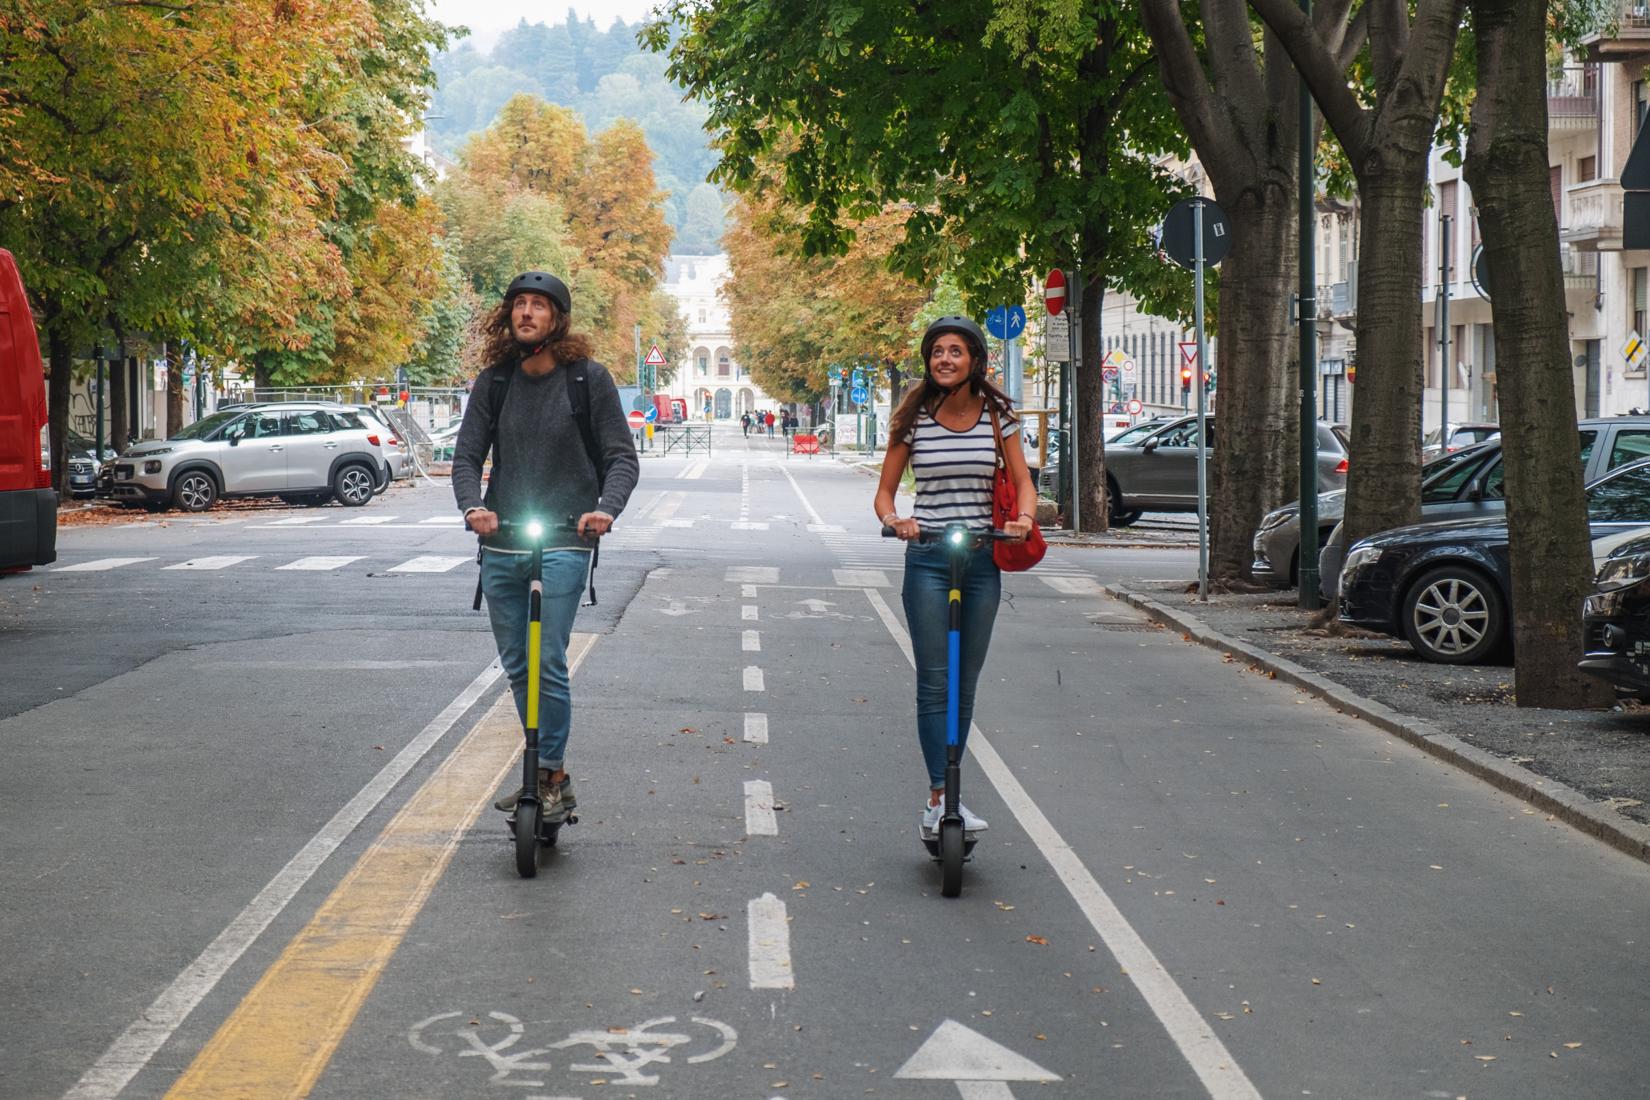 Riders torino - Urban Green Friday